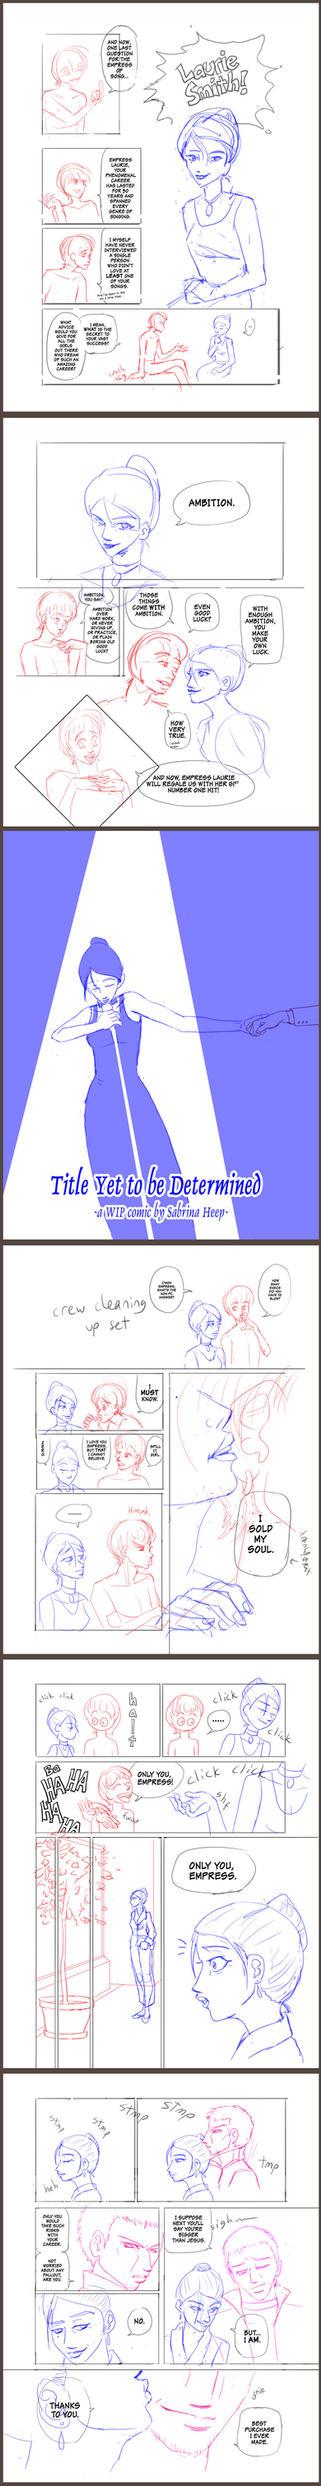 NaNo comic: opening scene by slr2moons